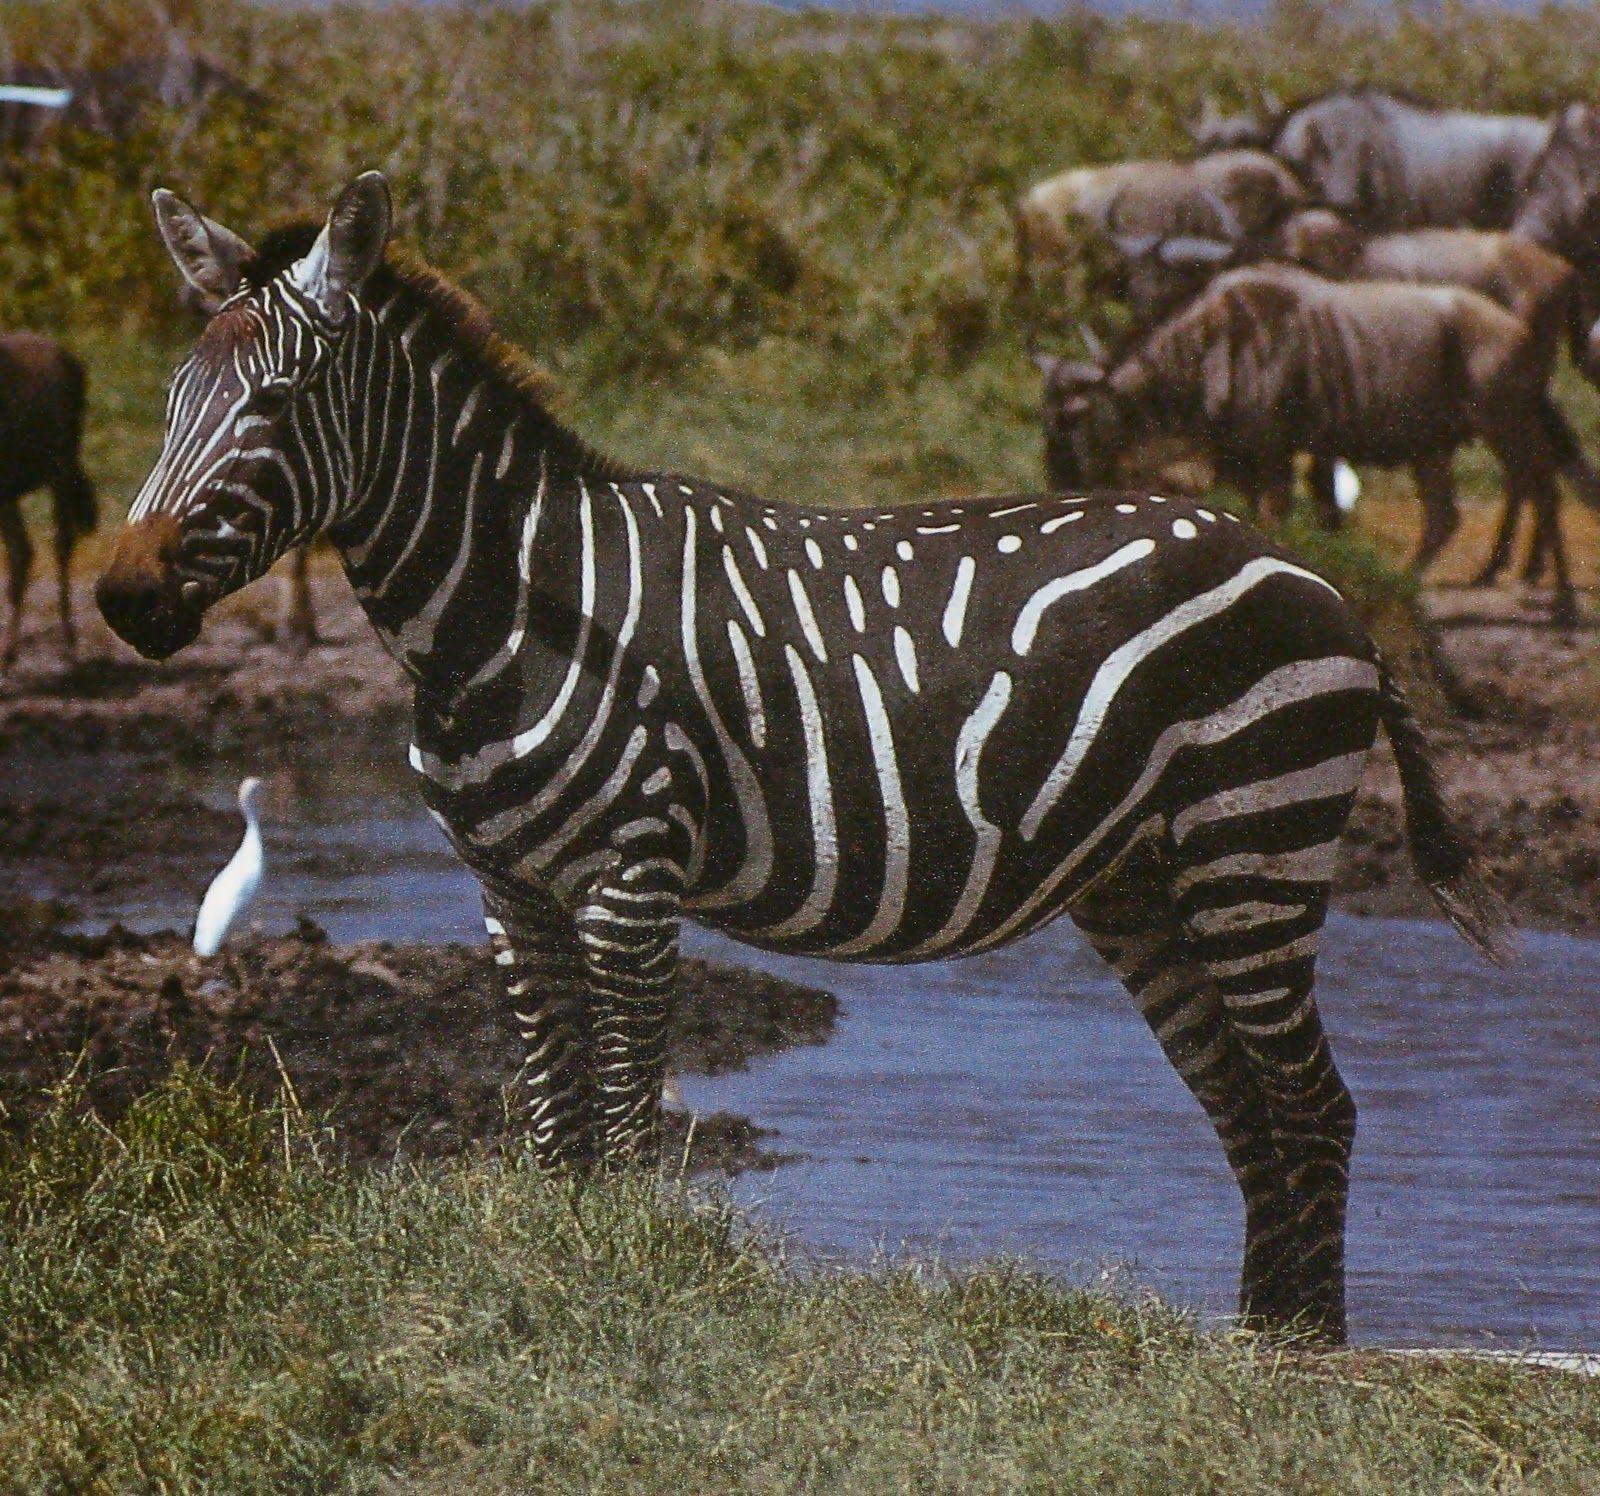 Sometimes, zebras are born with some strange stripe